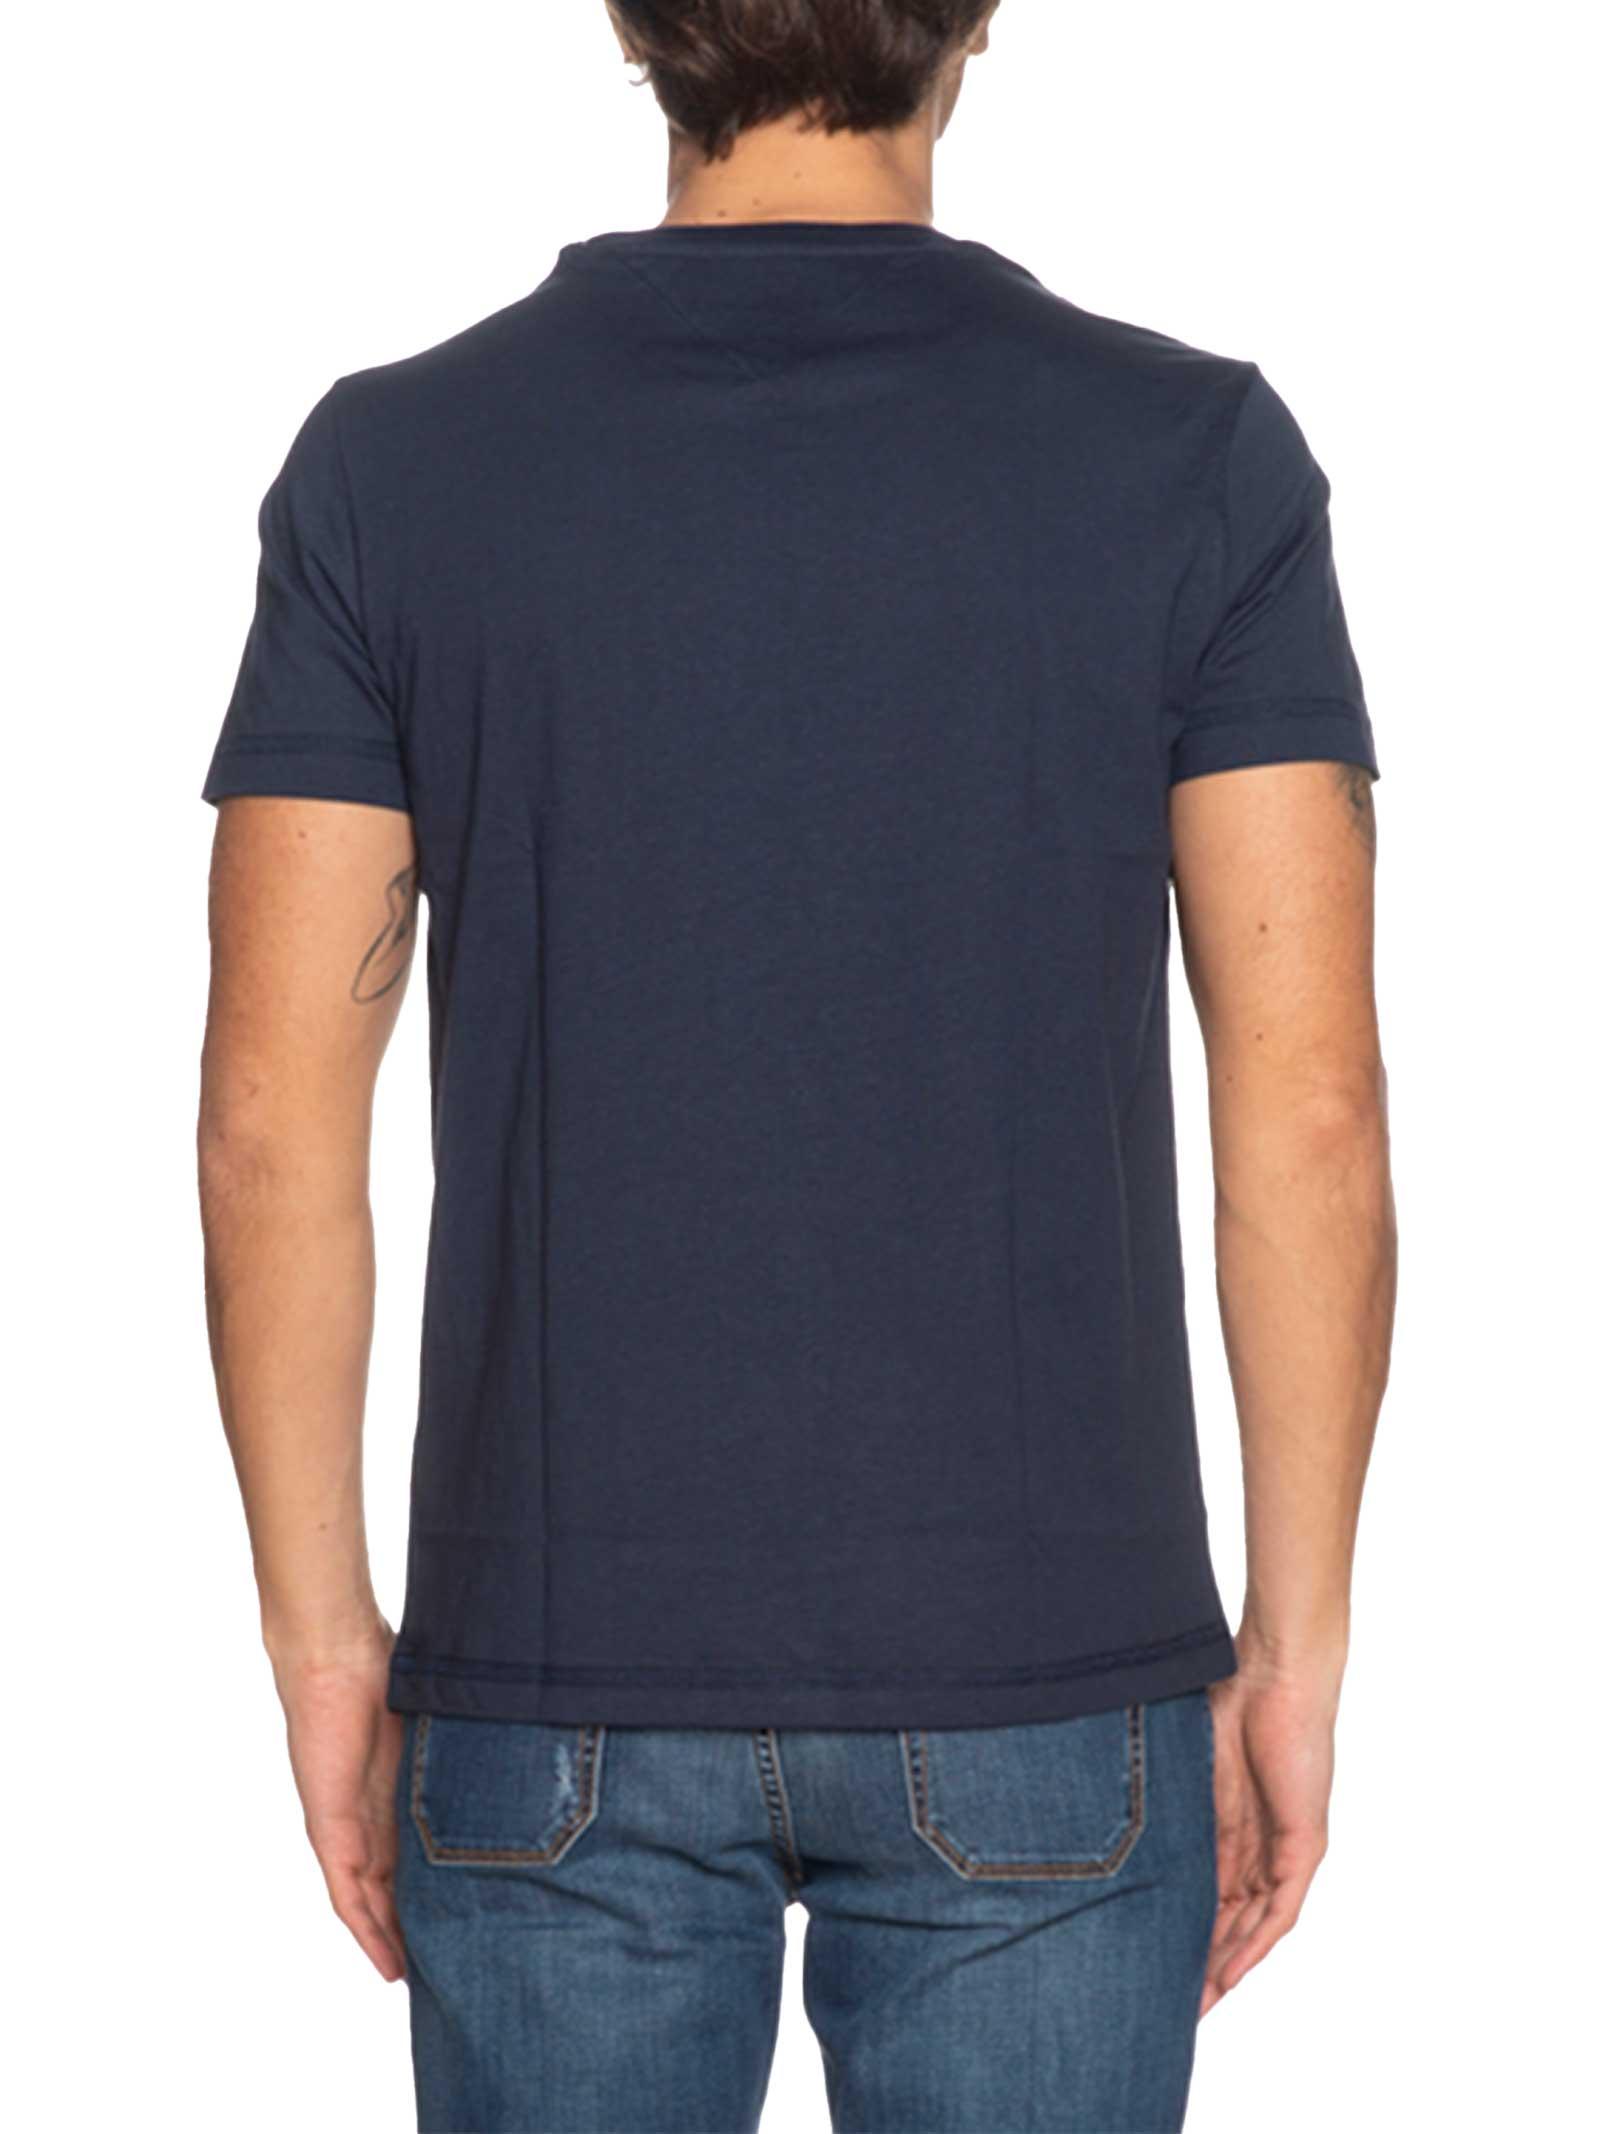 T-SHIRT UOMO TOMMY HILFIGER | T-shirt | DM0DM10099C87